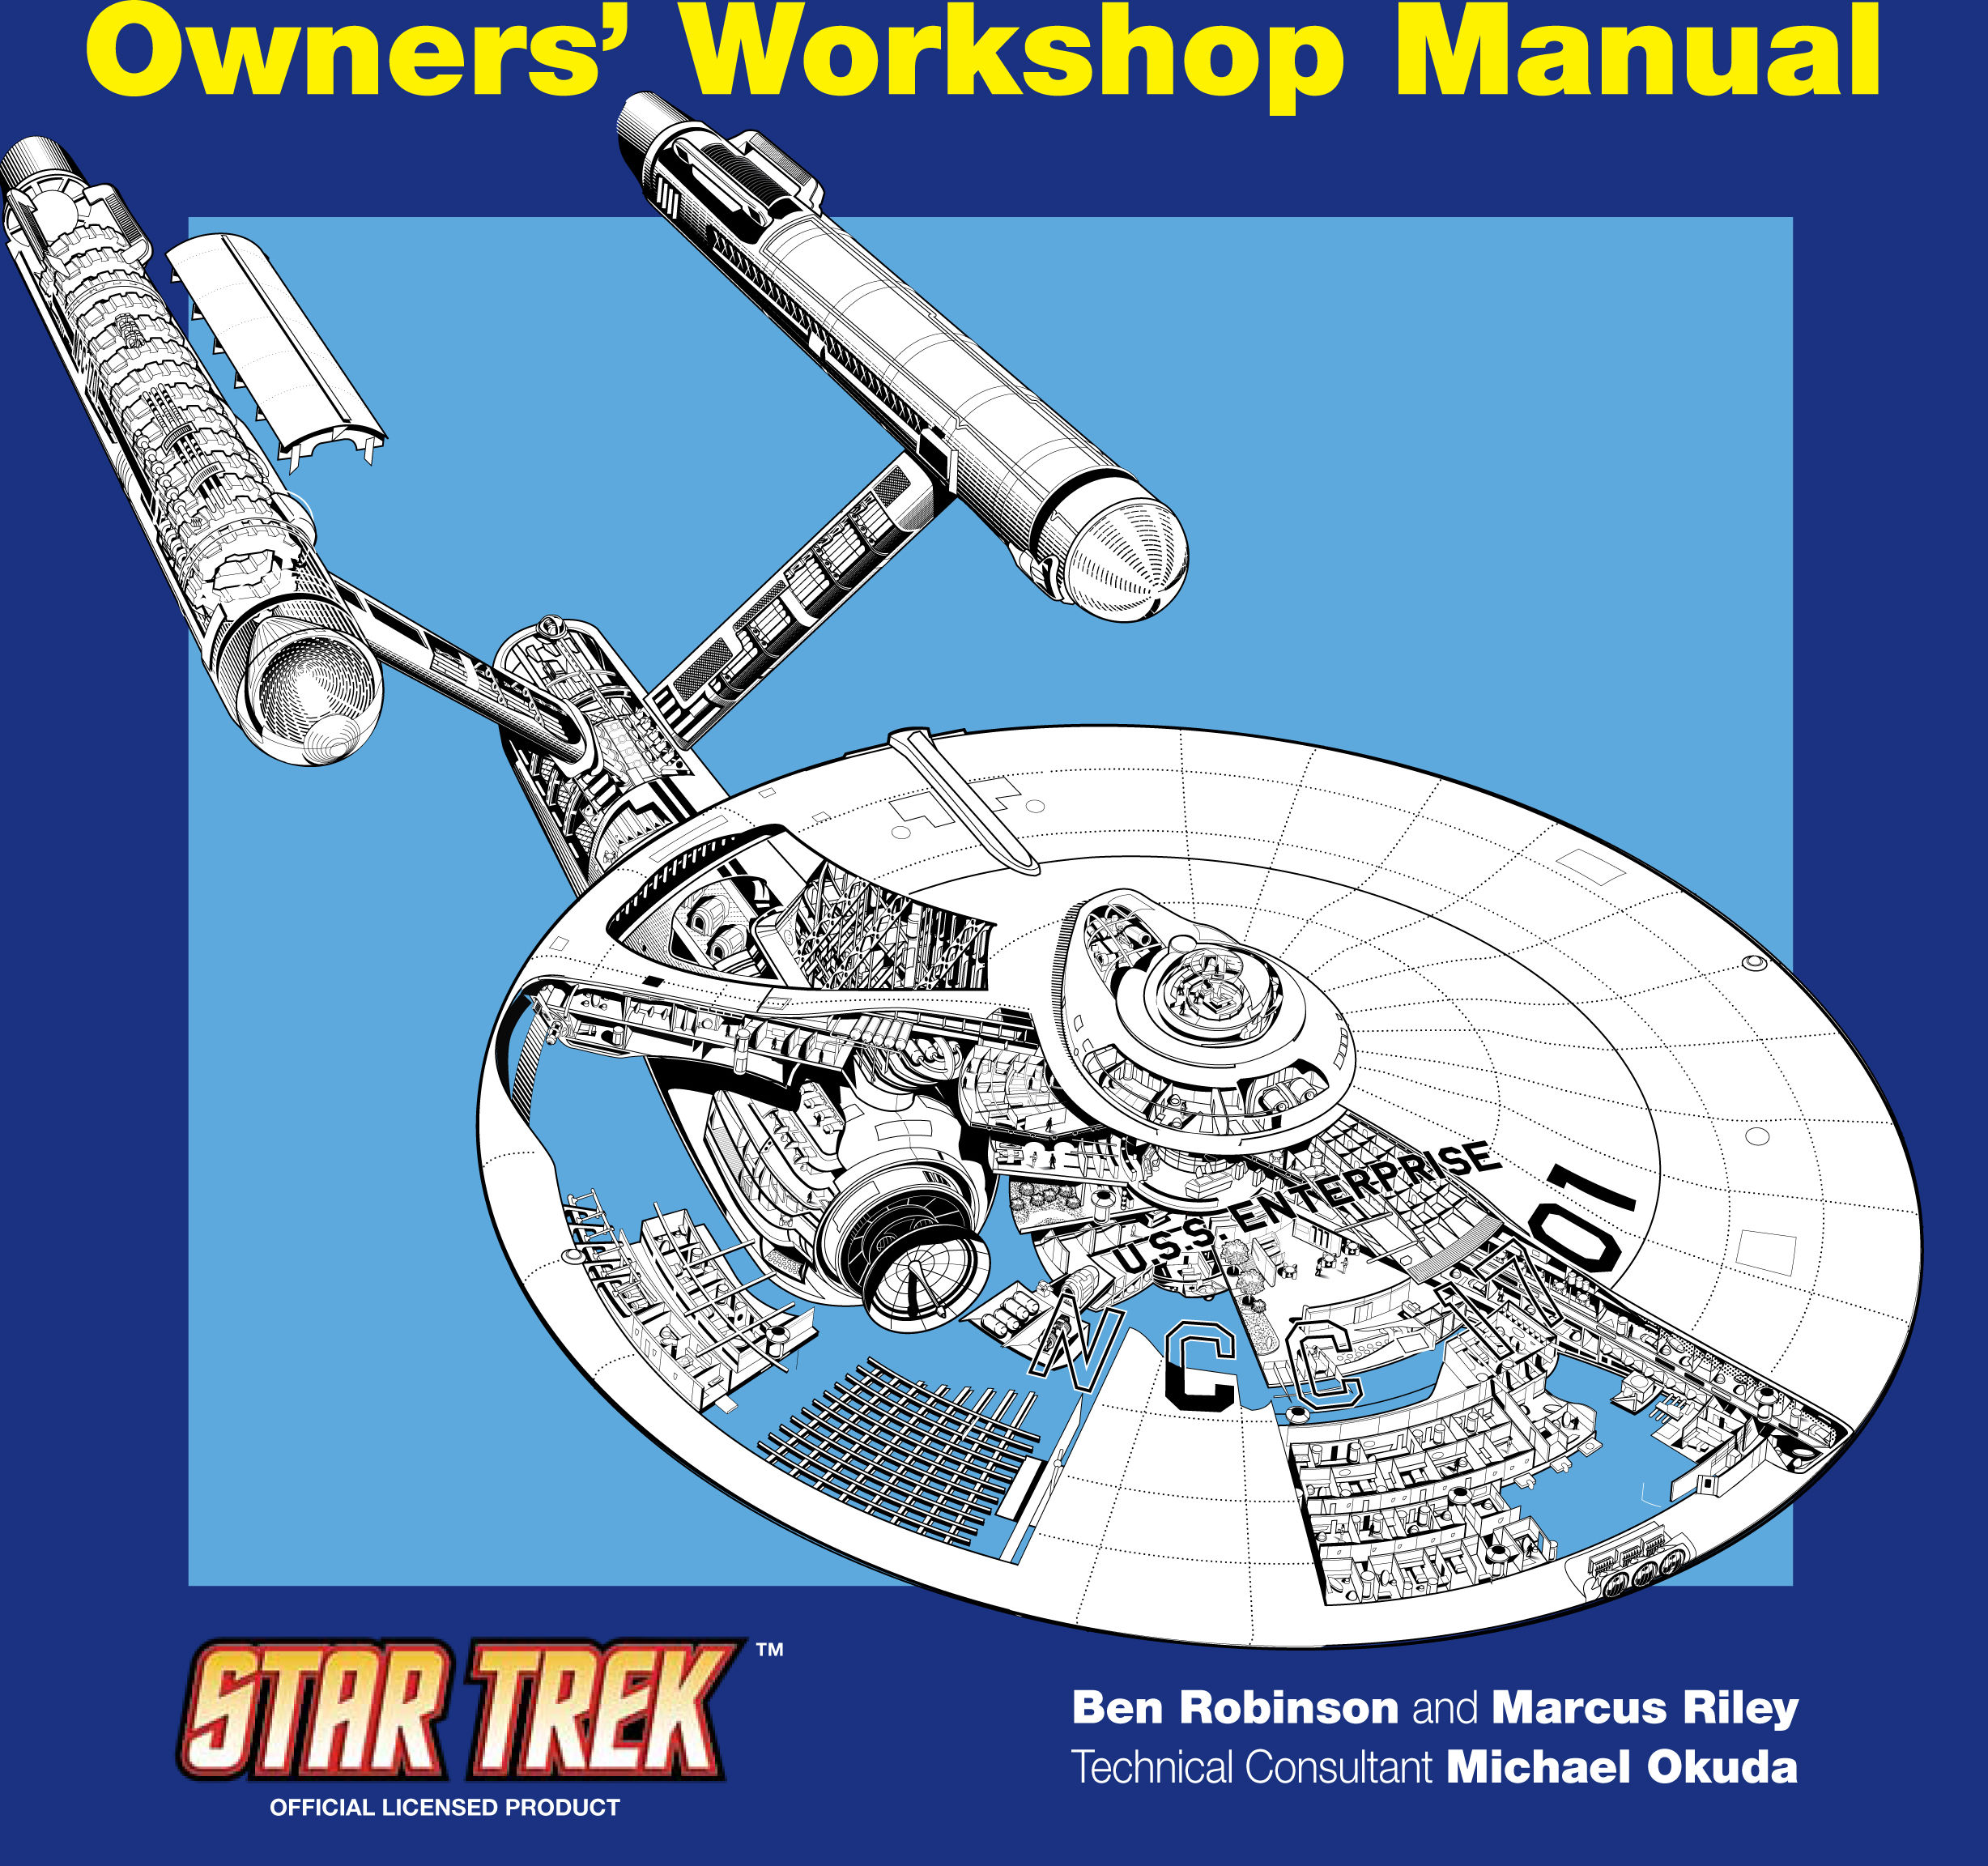 Conspiracy Theory: Star Trek based on secret space program?